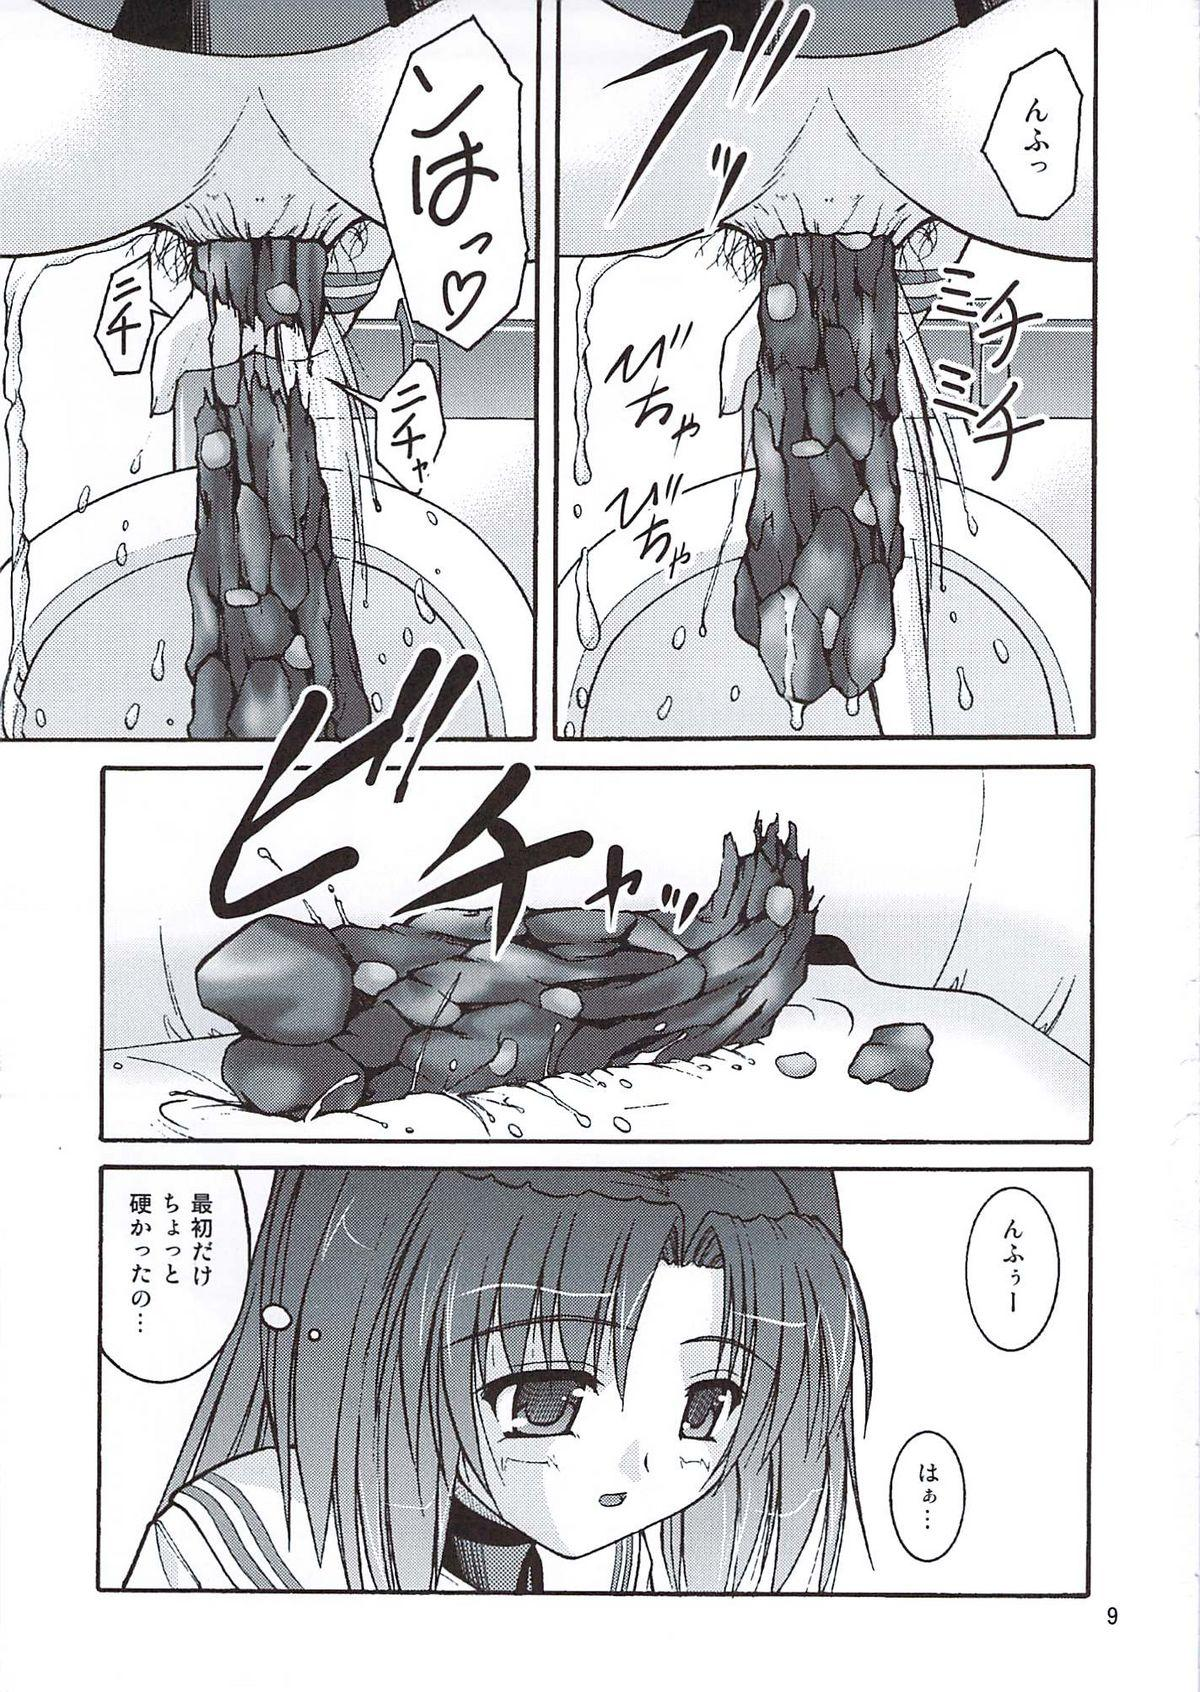 Bou Yuumei Koukou Joshi Toilet Tousatsu 2-jigen Bishoujo Hen Vol. 4 7